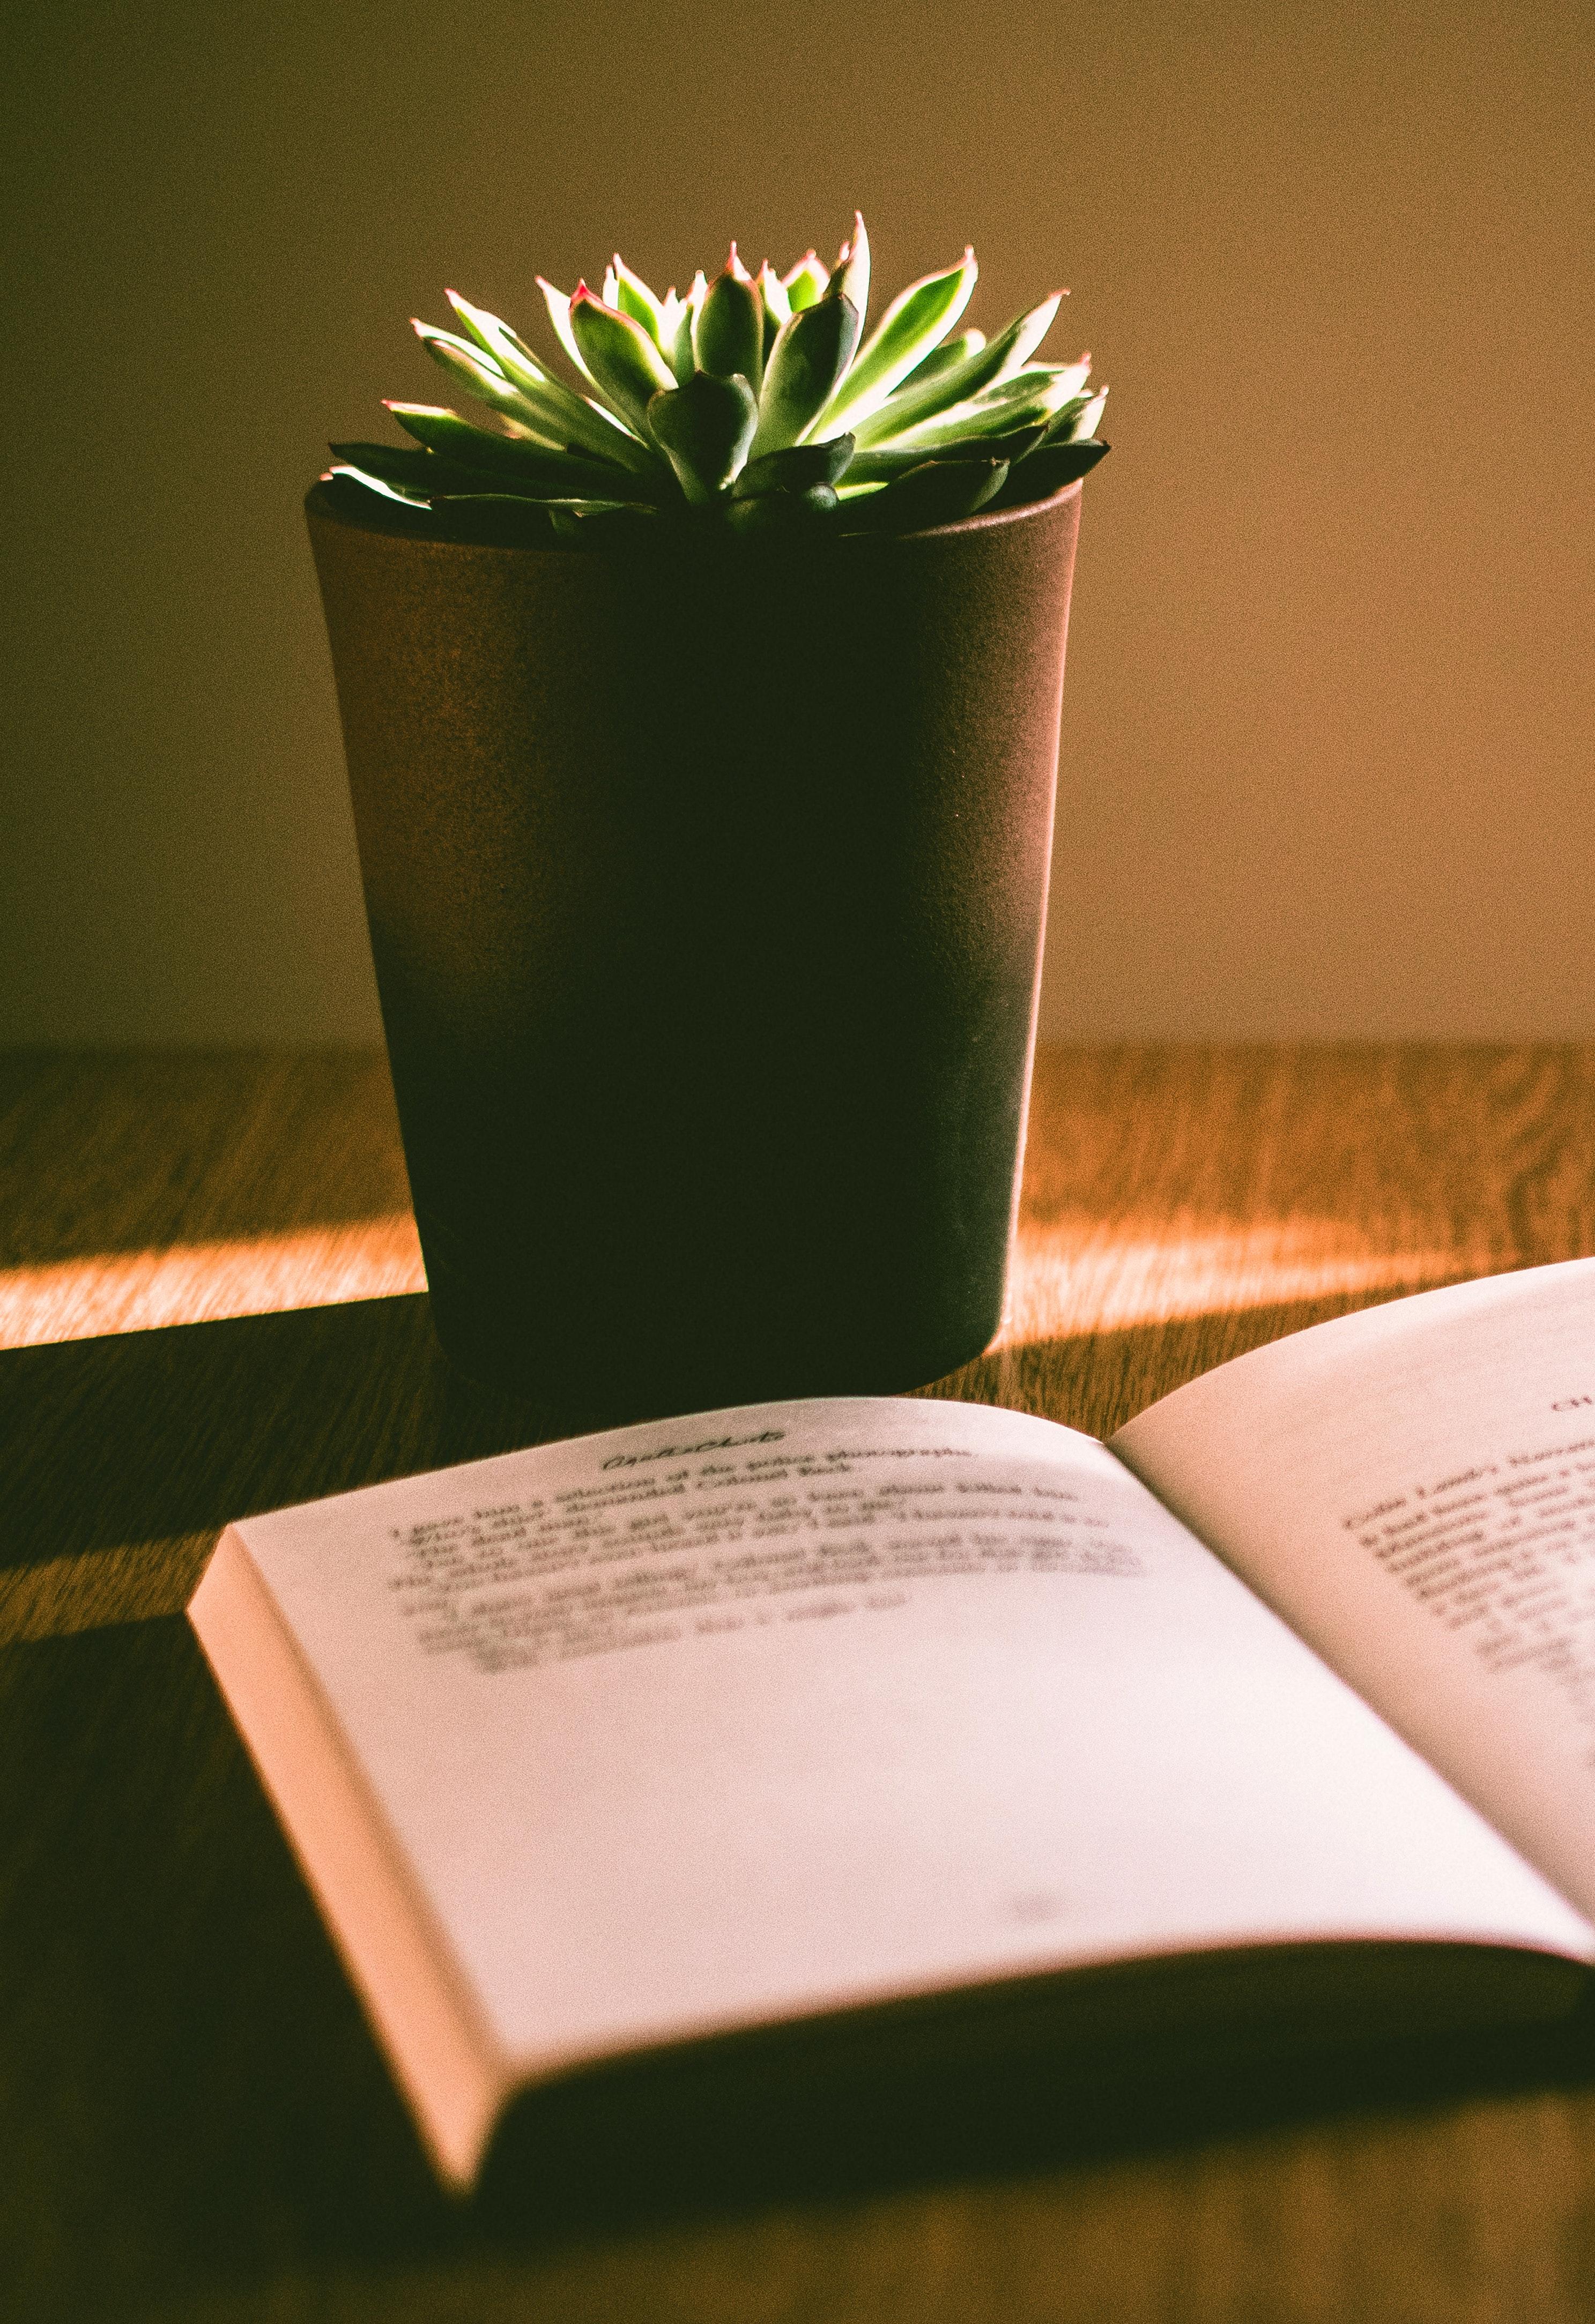 blur-book-botanic-1036372